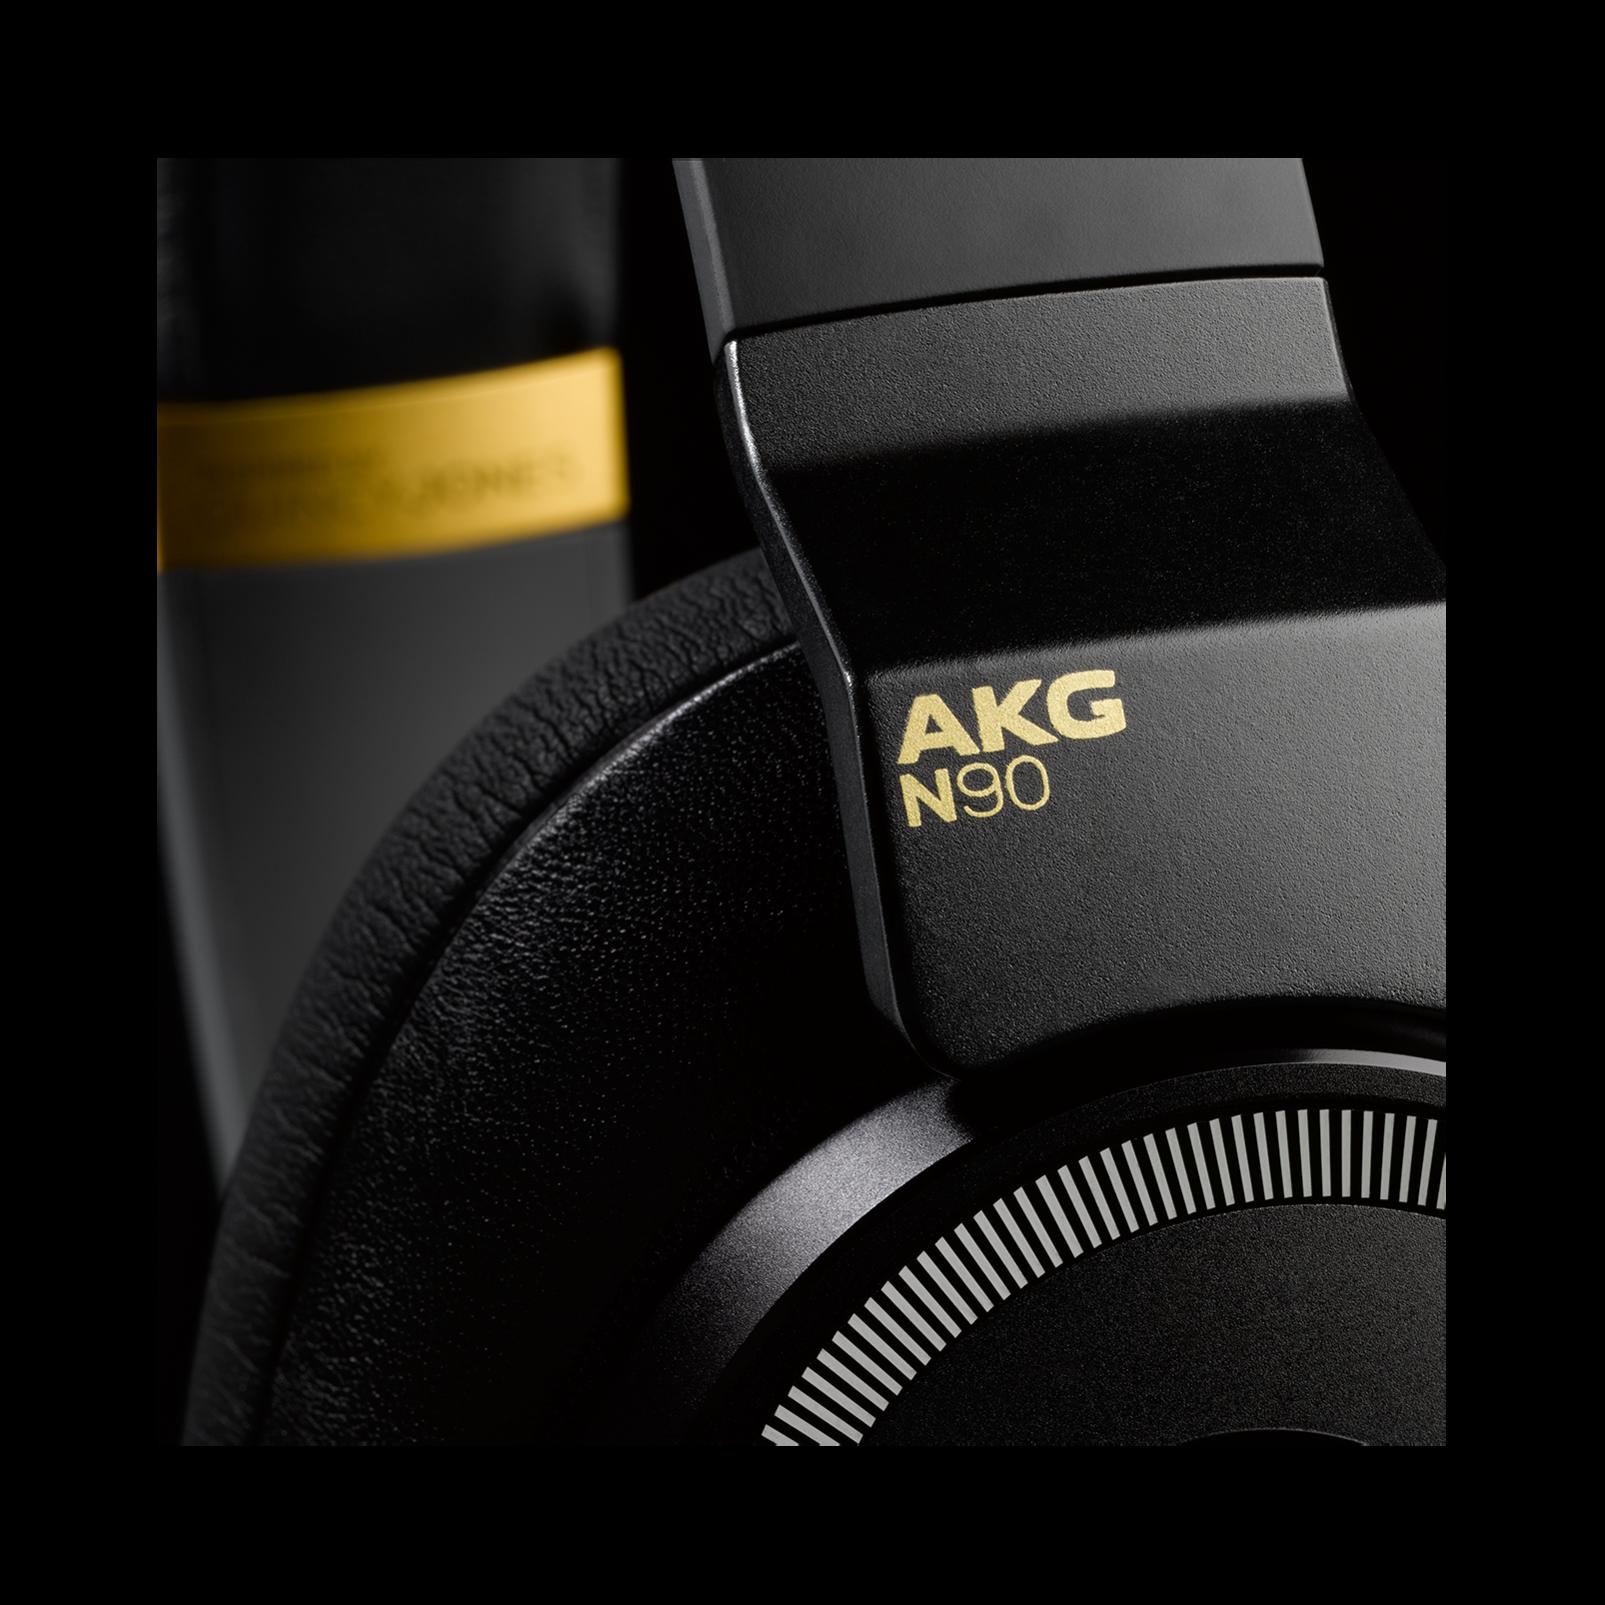 N90Q - Black - Reference class auto-calibrating noise-cancelling headphones - Detailshot 13